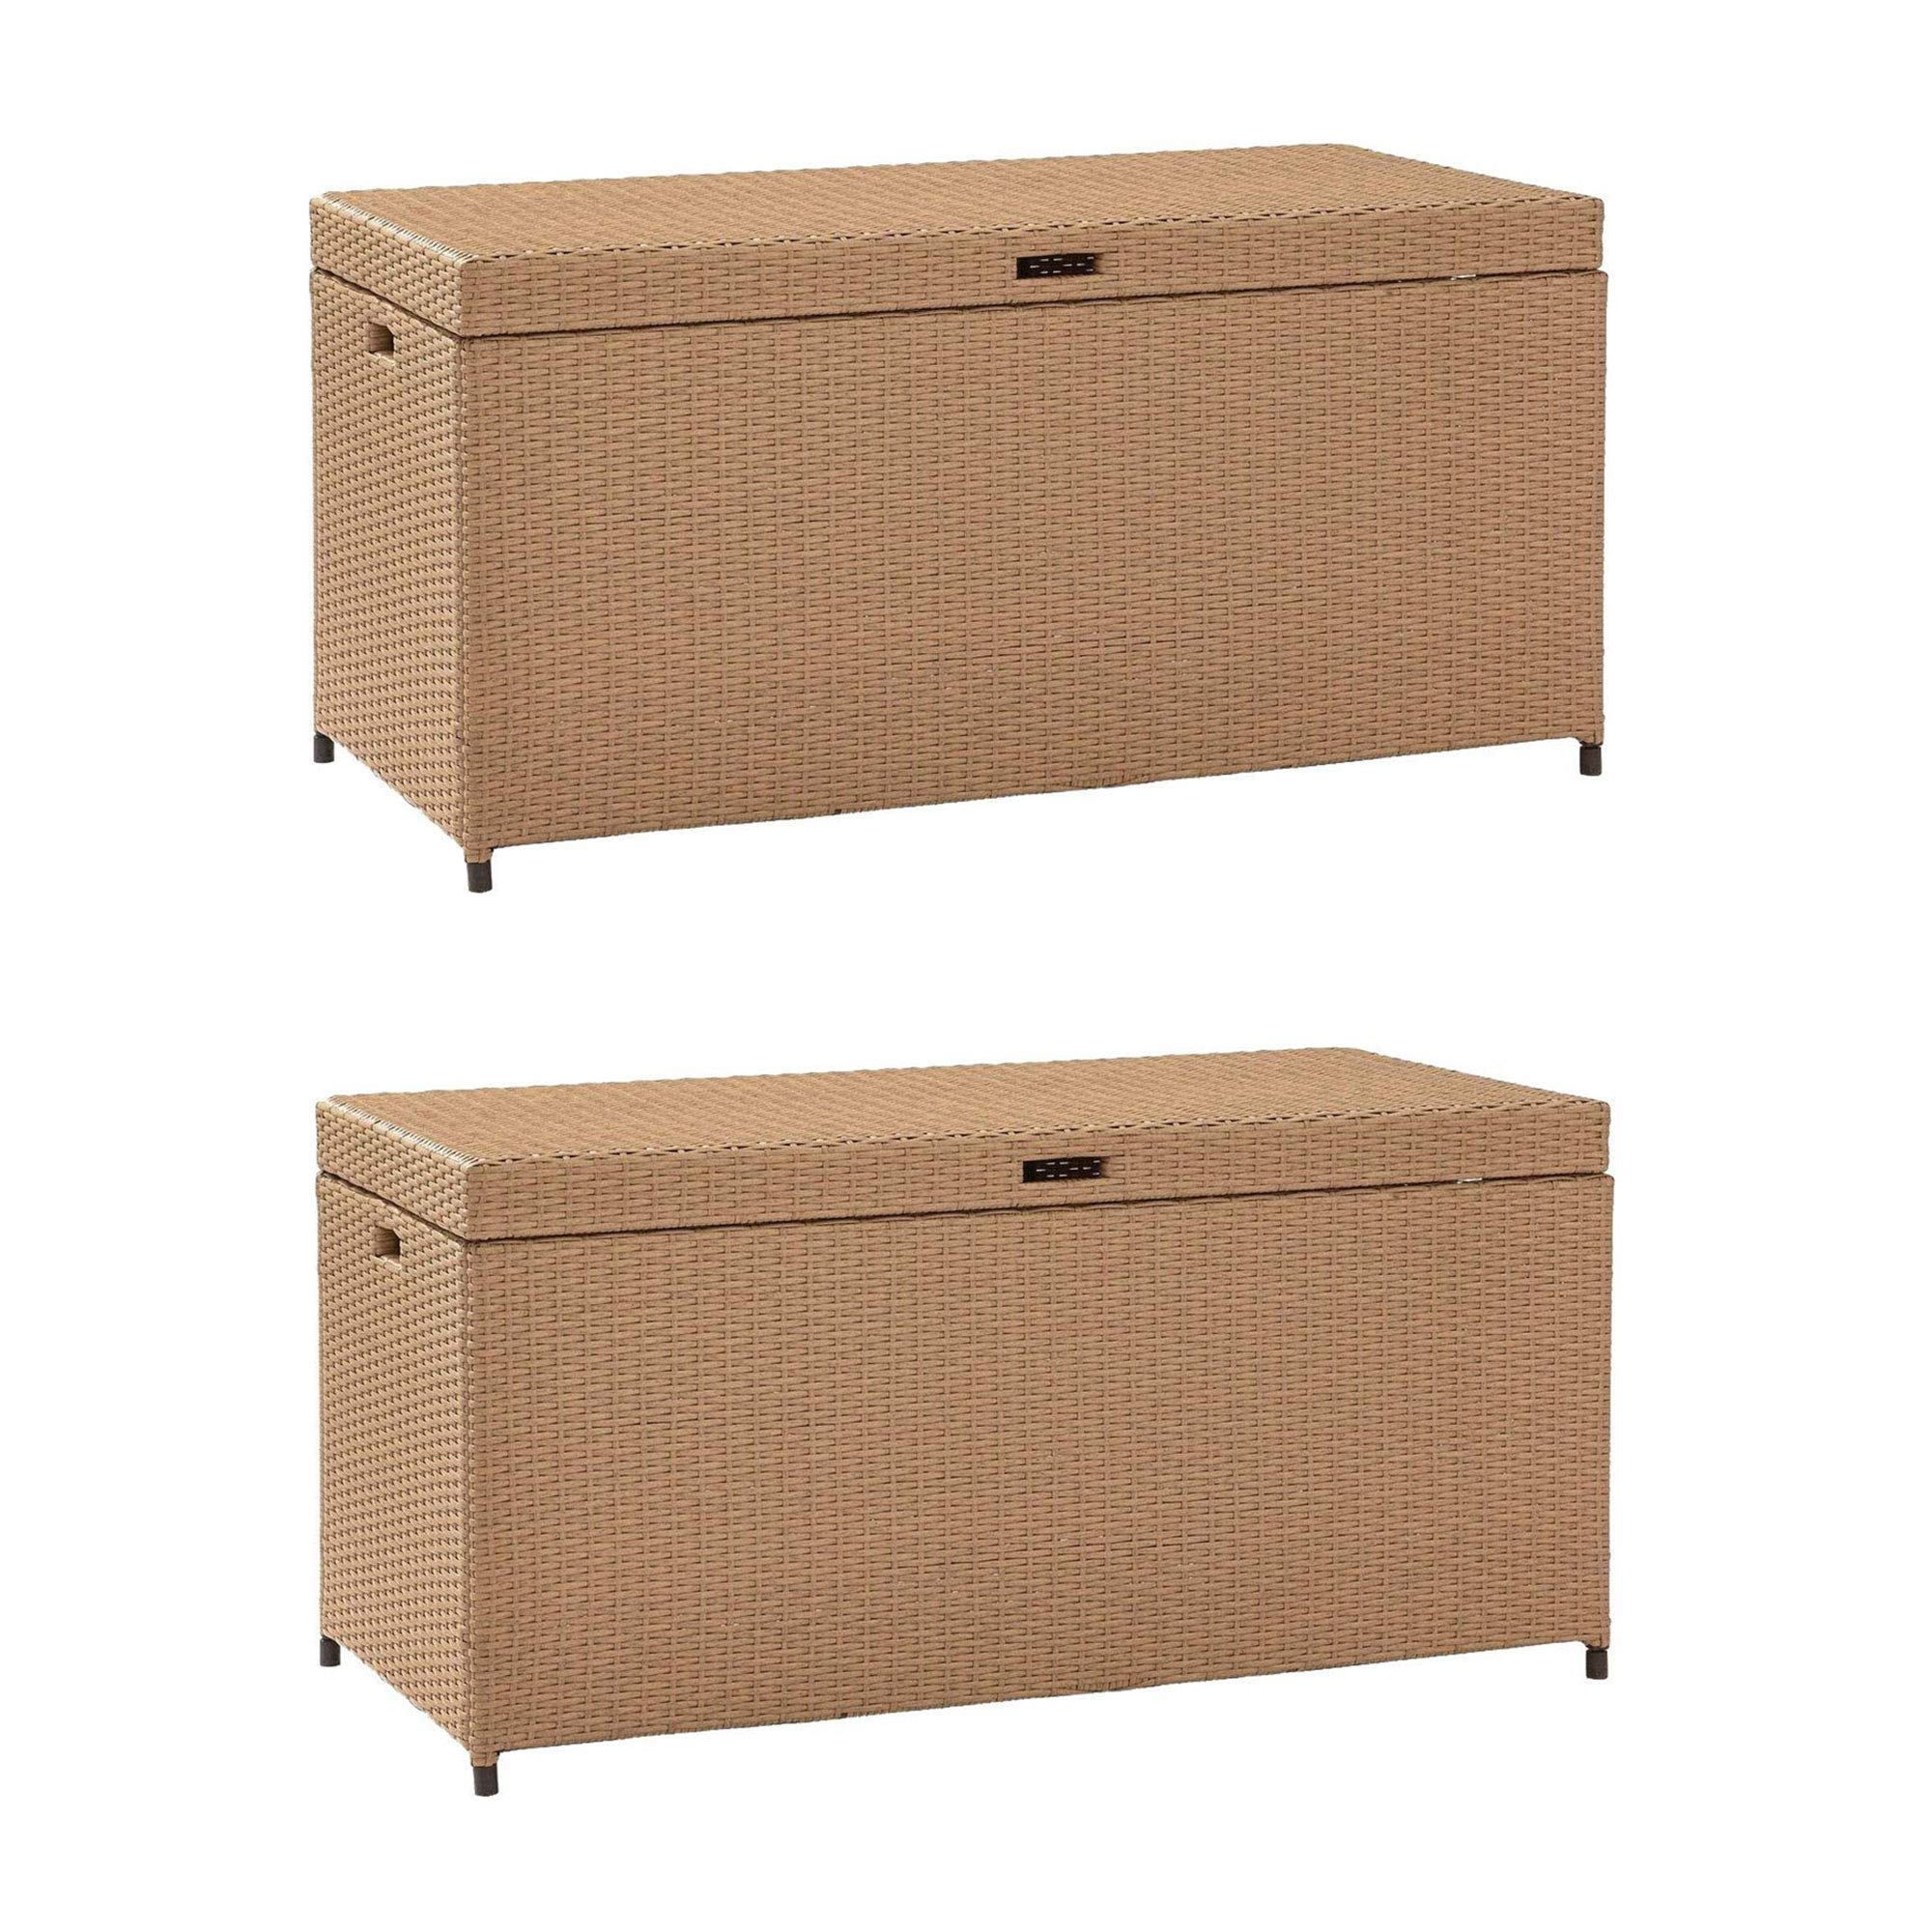 Crosely Furniture Palm Harbor Wicker Resin Outdoor Storage Bin, Light Brown (2 Pack)